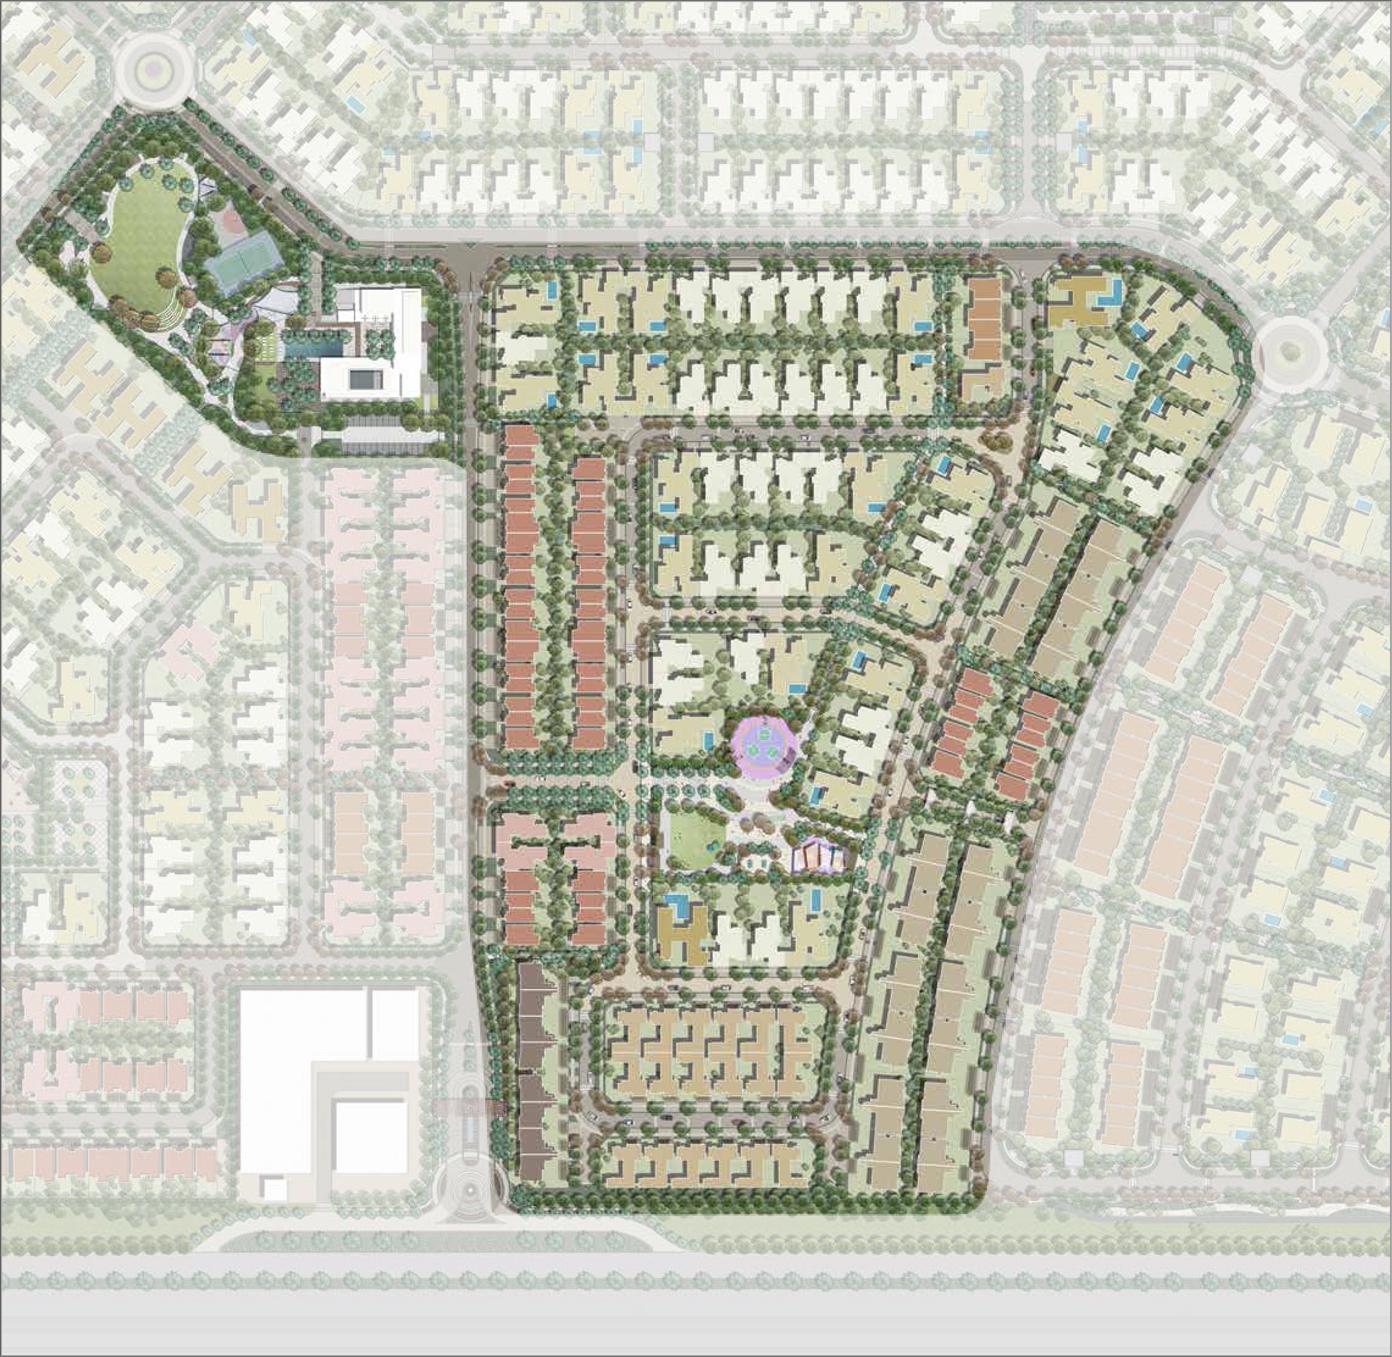 Al-Yasmeen-Al-Zahia-Sharjah Master Plan